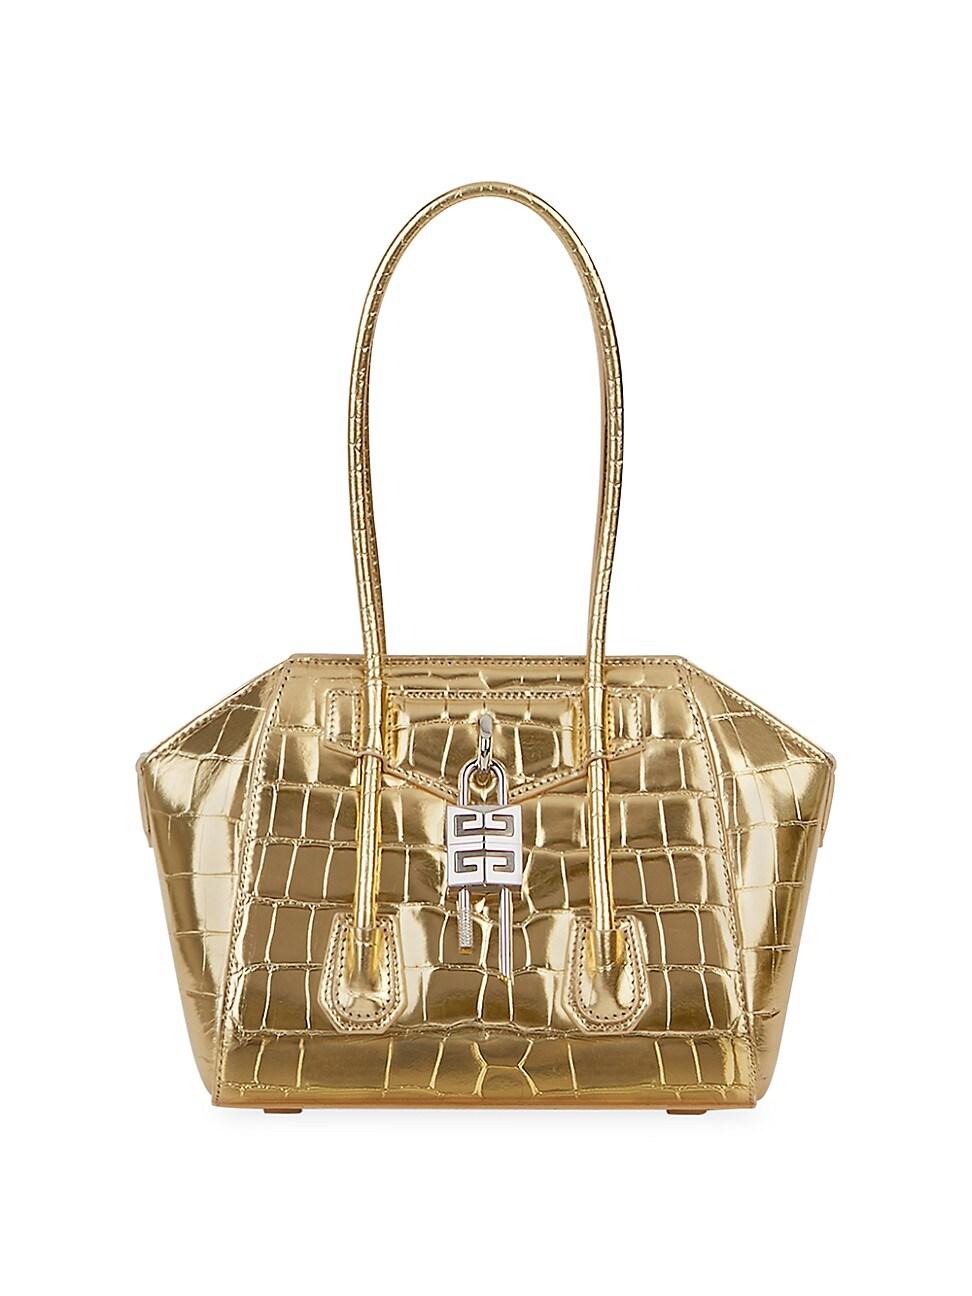 Givenchy Leathers WOMEN'S MINI ANTIGONA LOCK METALLIC CROC-EMBOSSED LEATHER SATCHEL